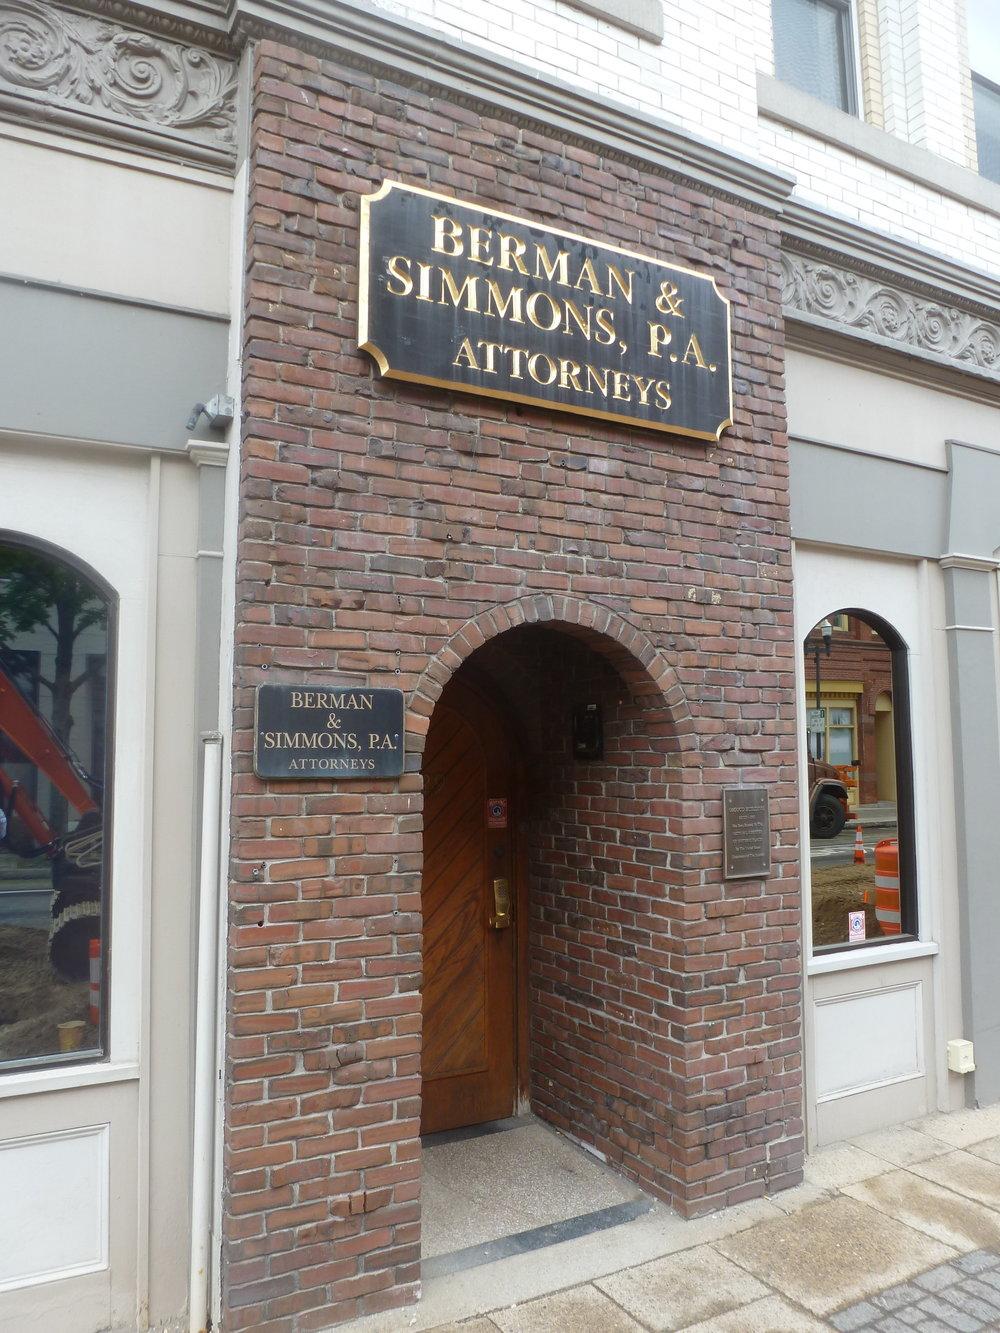 Osgood Building Entry_129 Lisbon Street_Lewiston_ME_Geoff Melhuish_5_31_2016.JPG